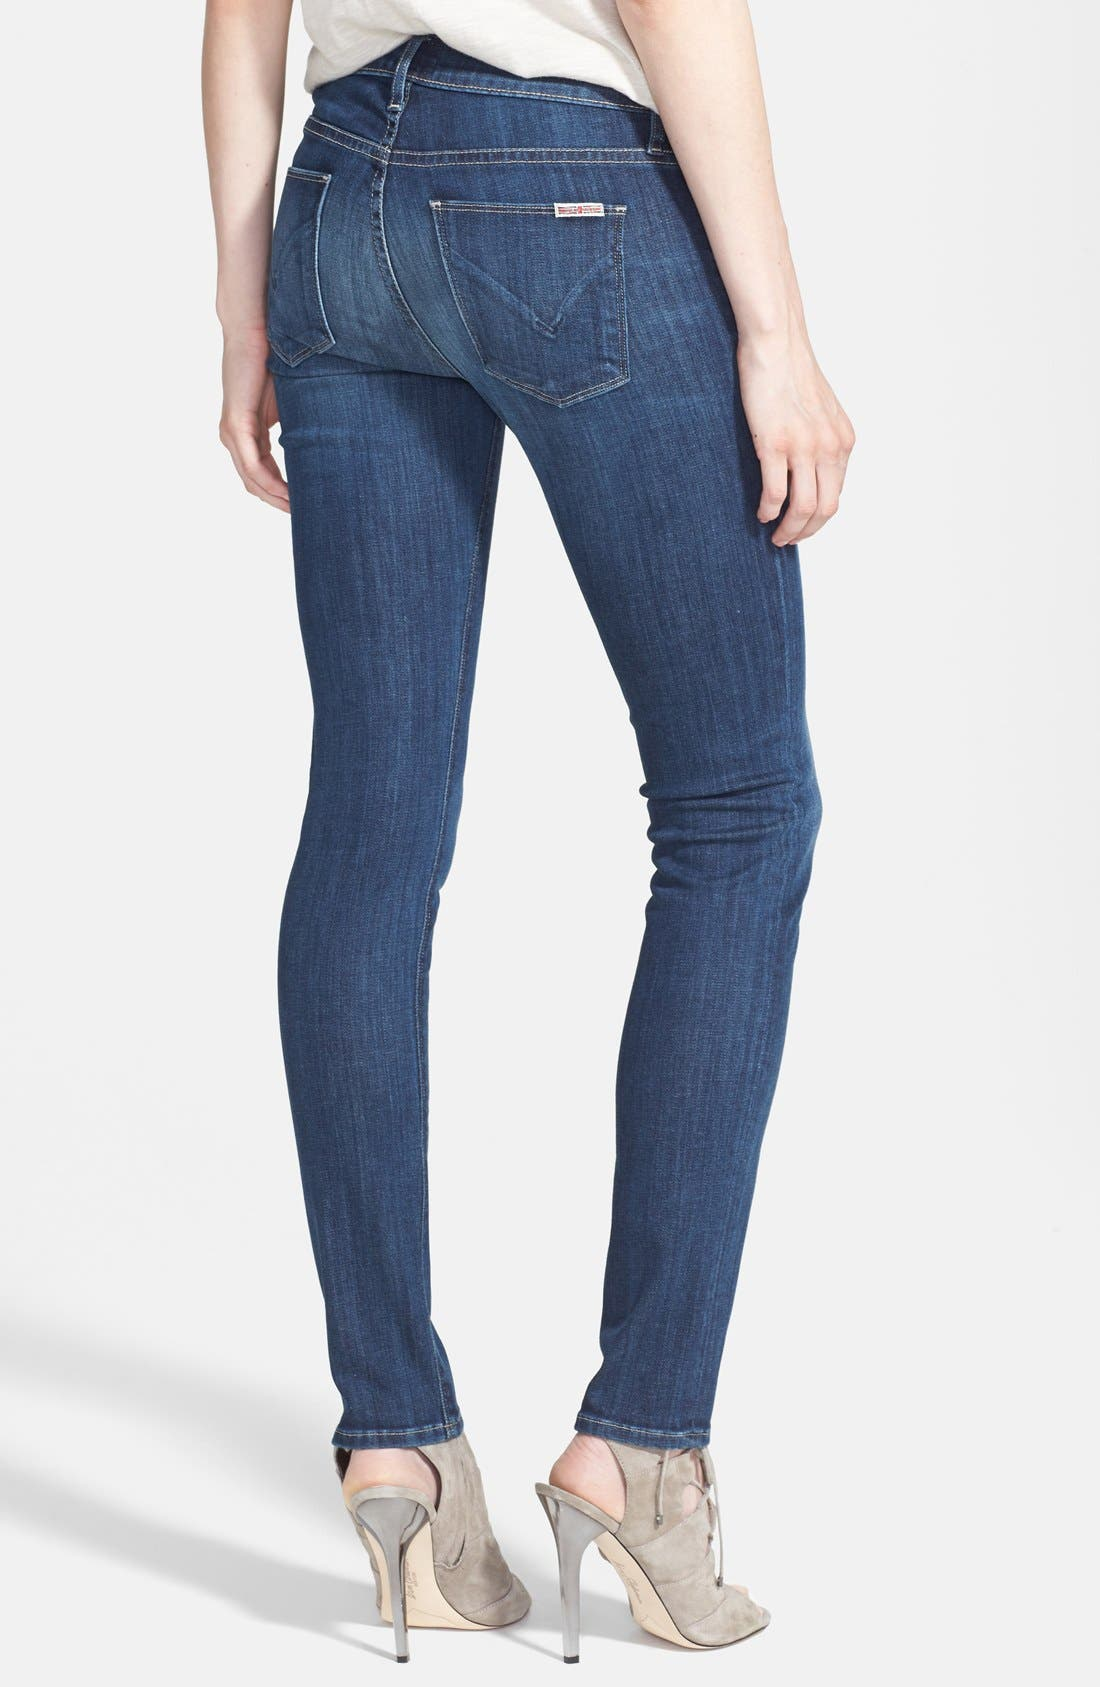 HUDSON JEANS, 'Collette' Skinny Jeans, Alternate thumbnail 5, color, 400